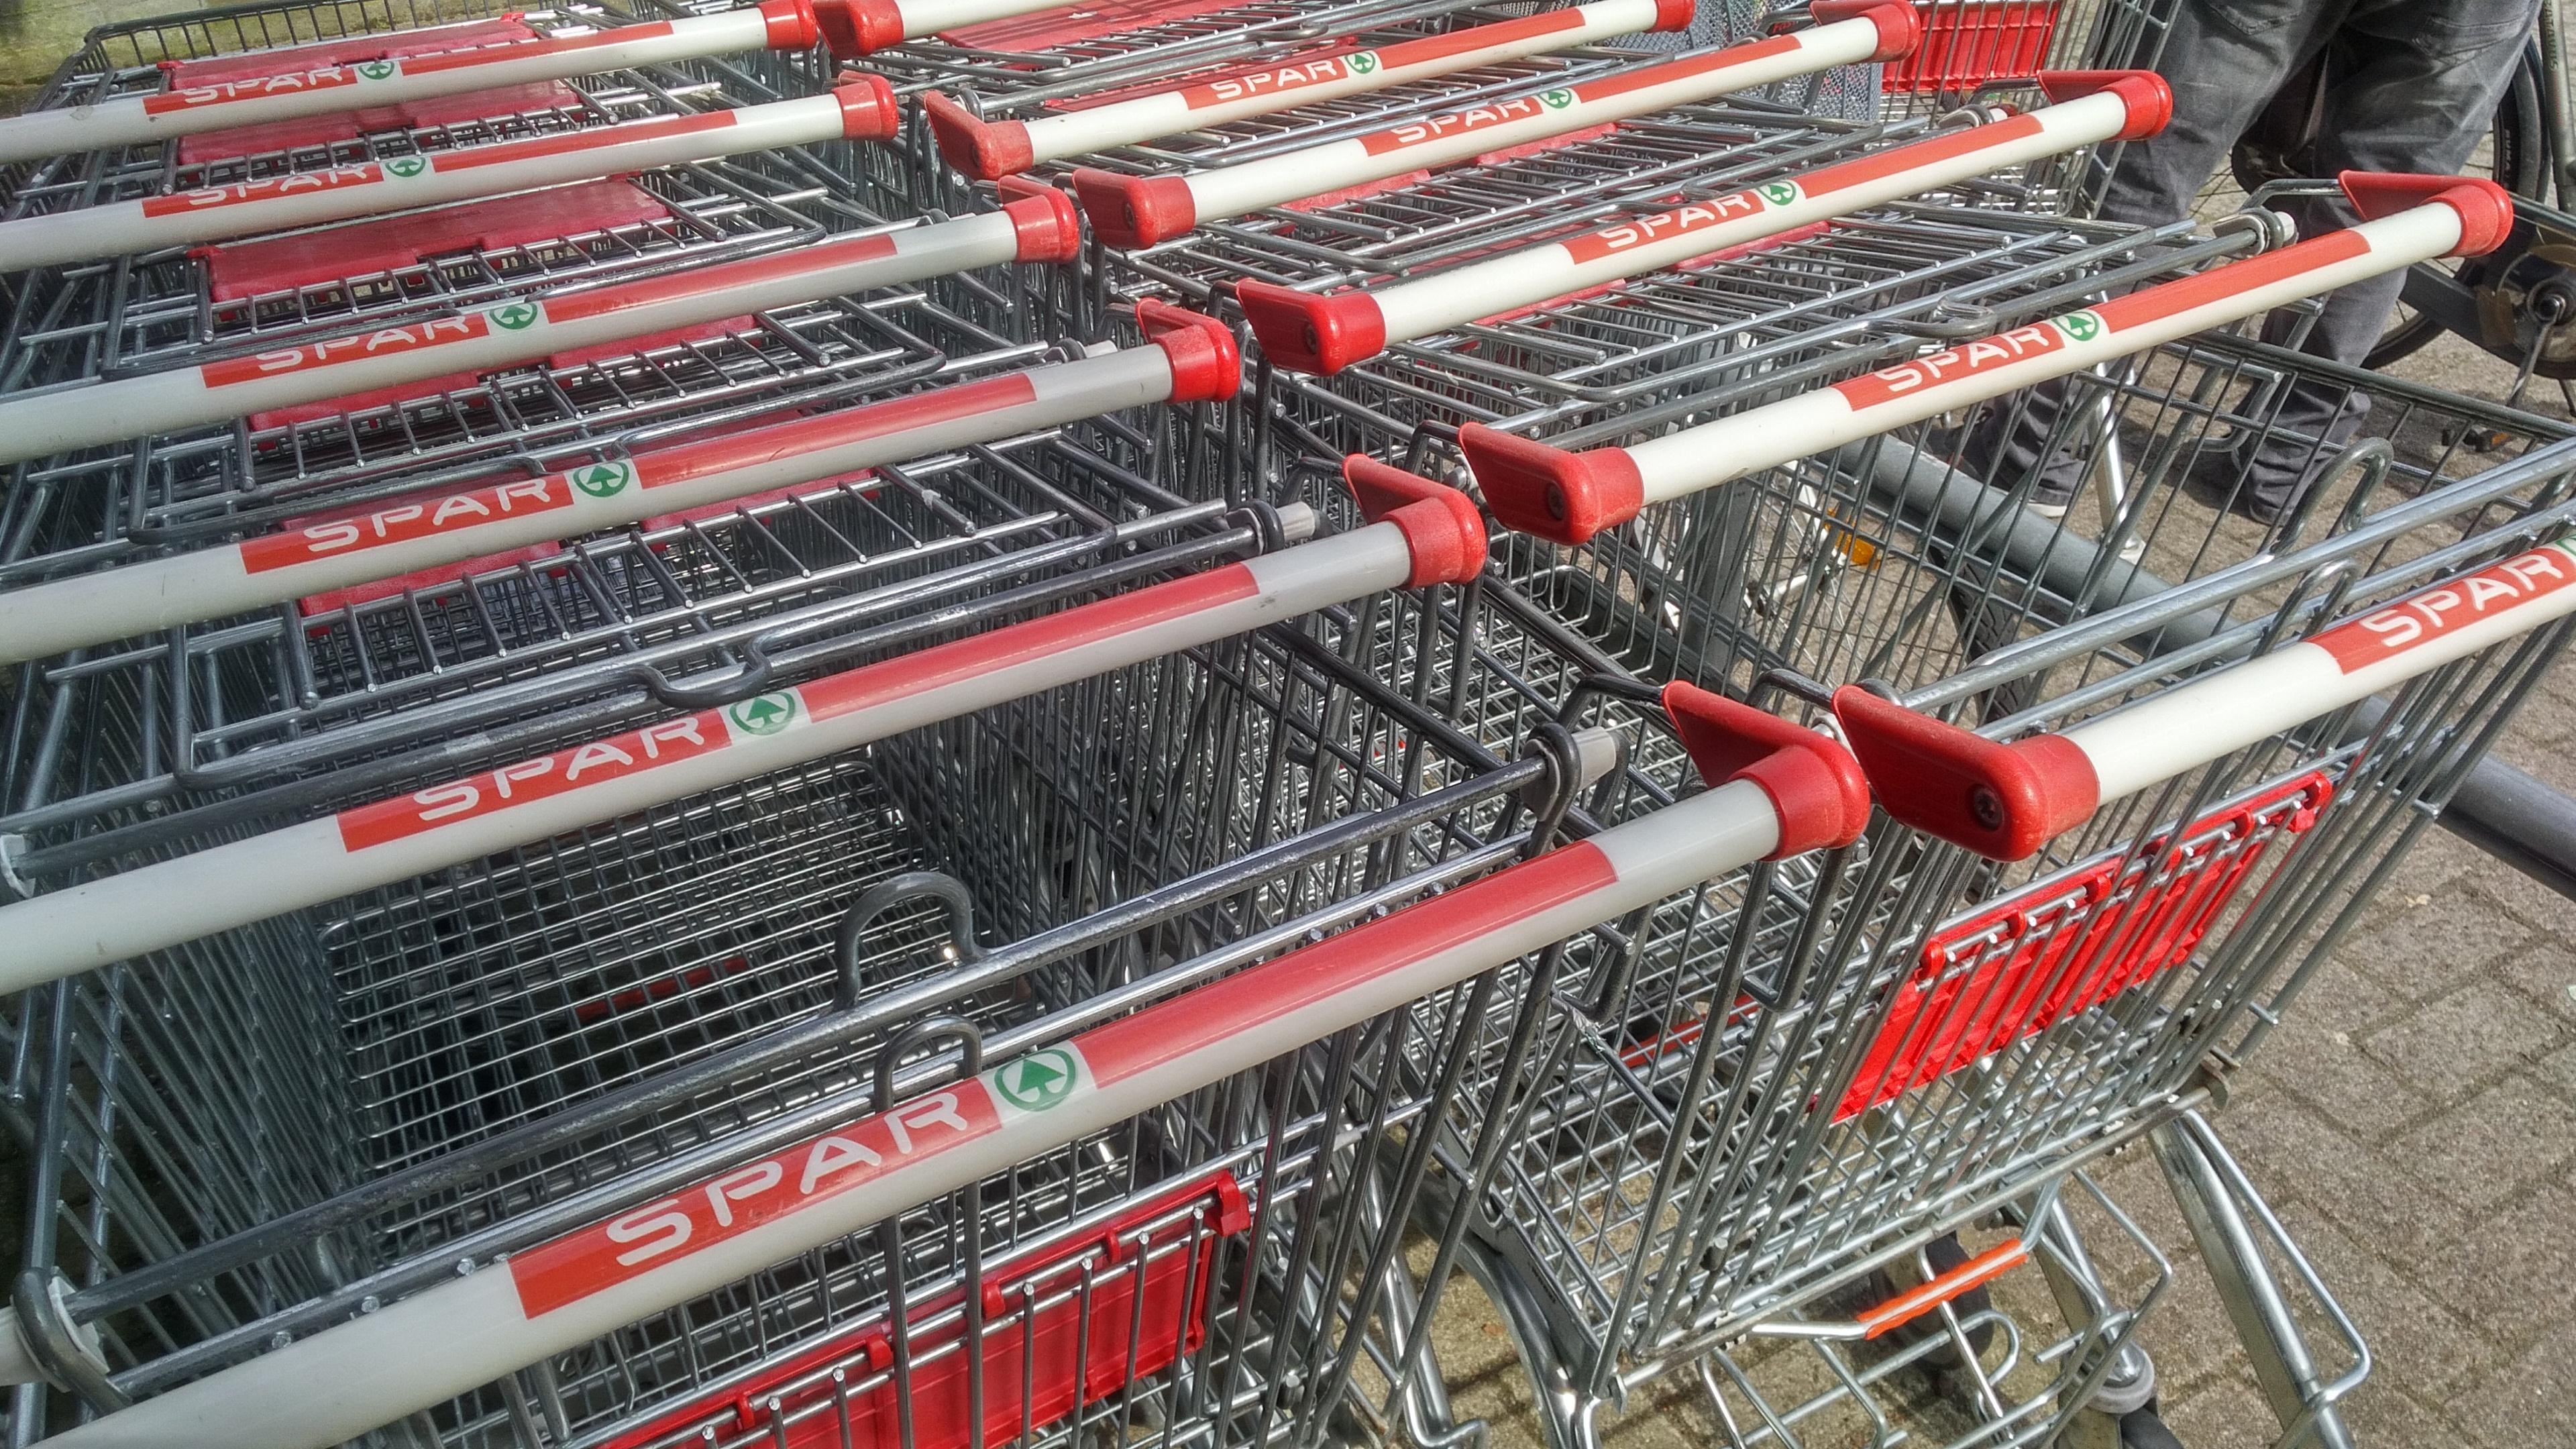 File:Spar shopping carts, Winschoten (2018).jpg - Wikimedia Commons